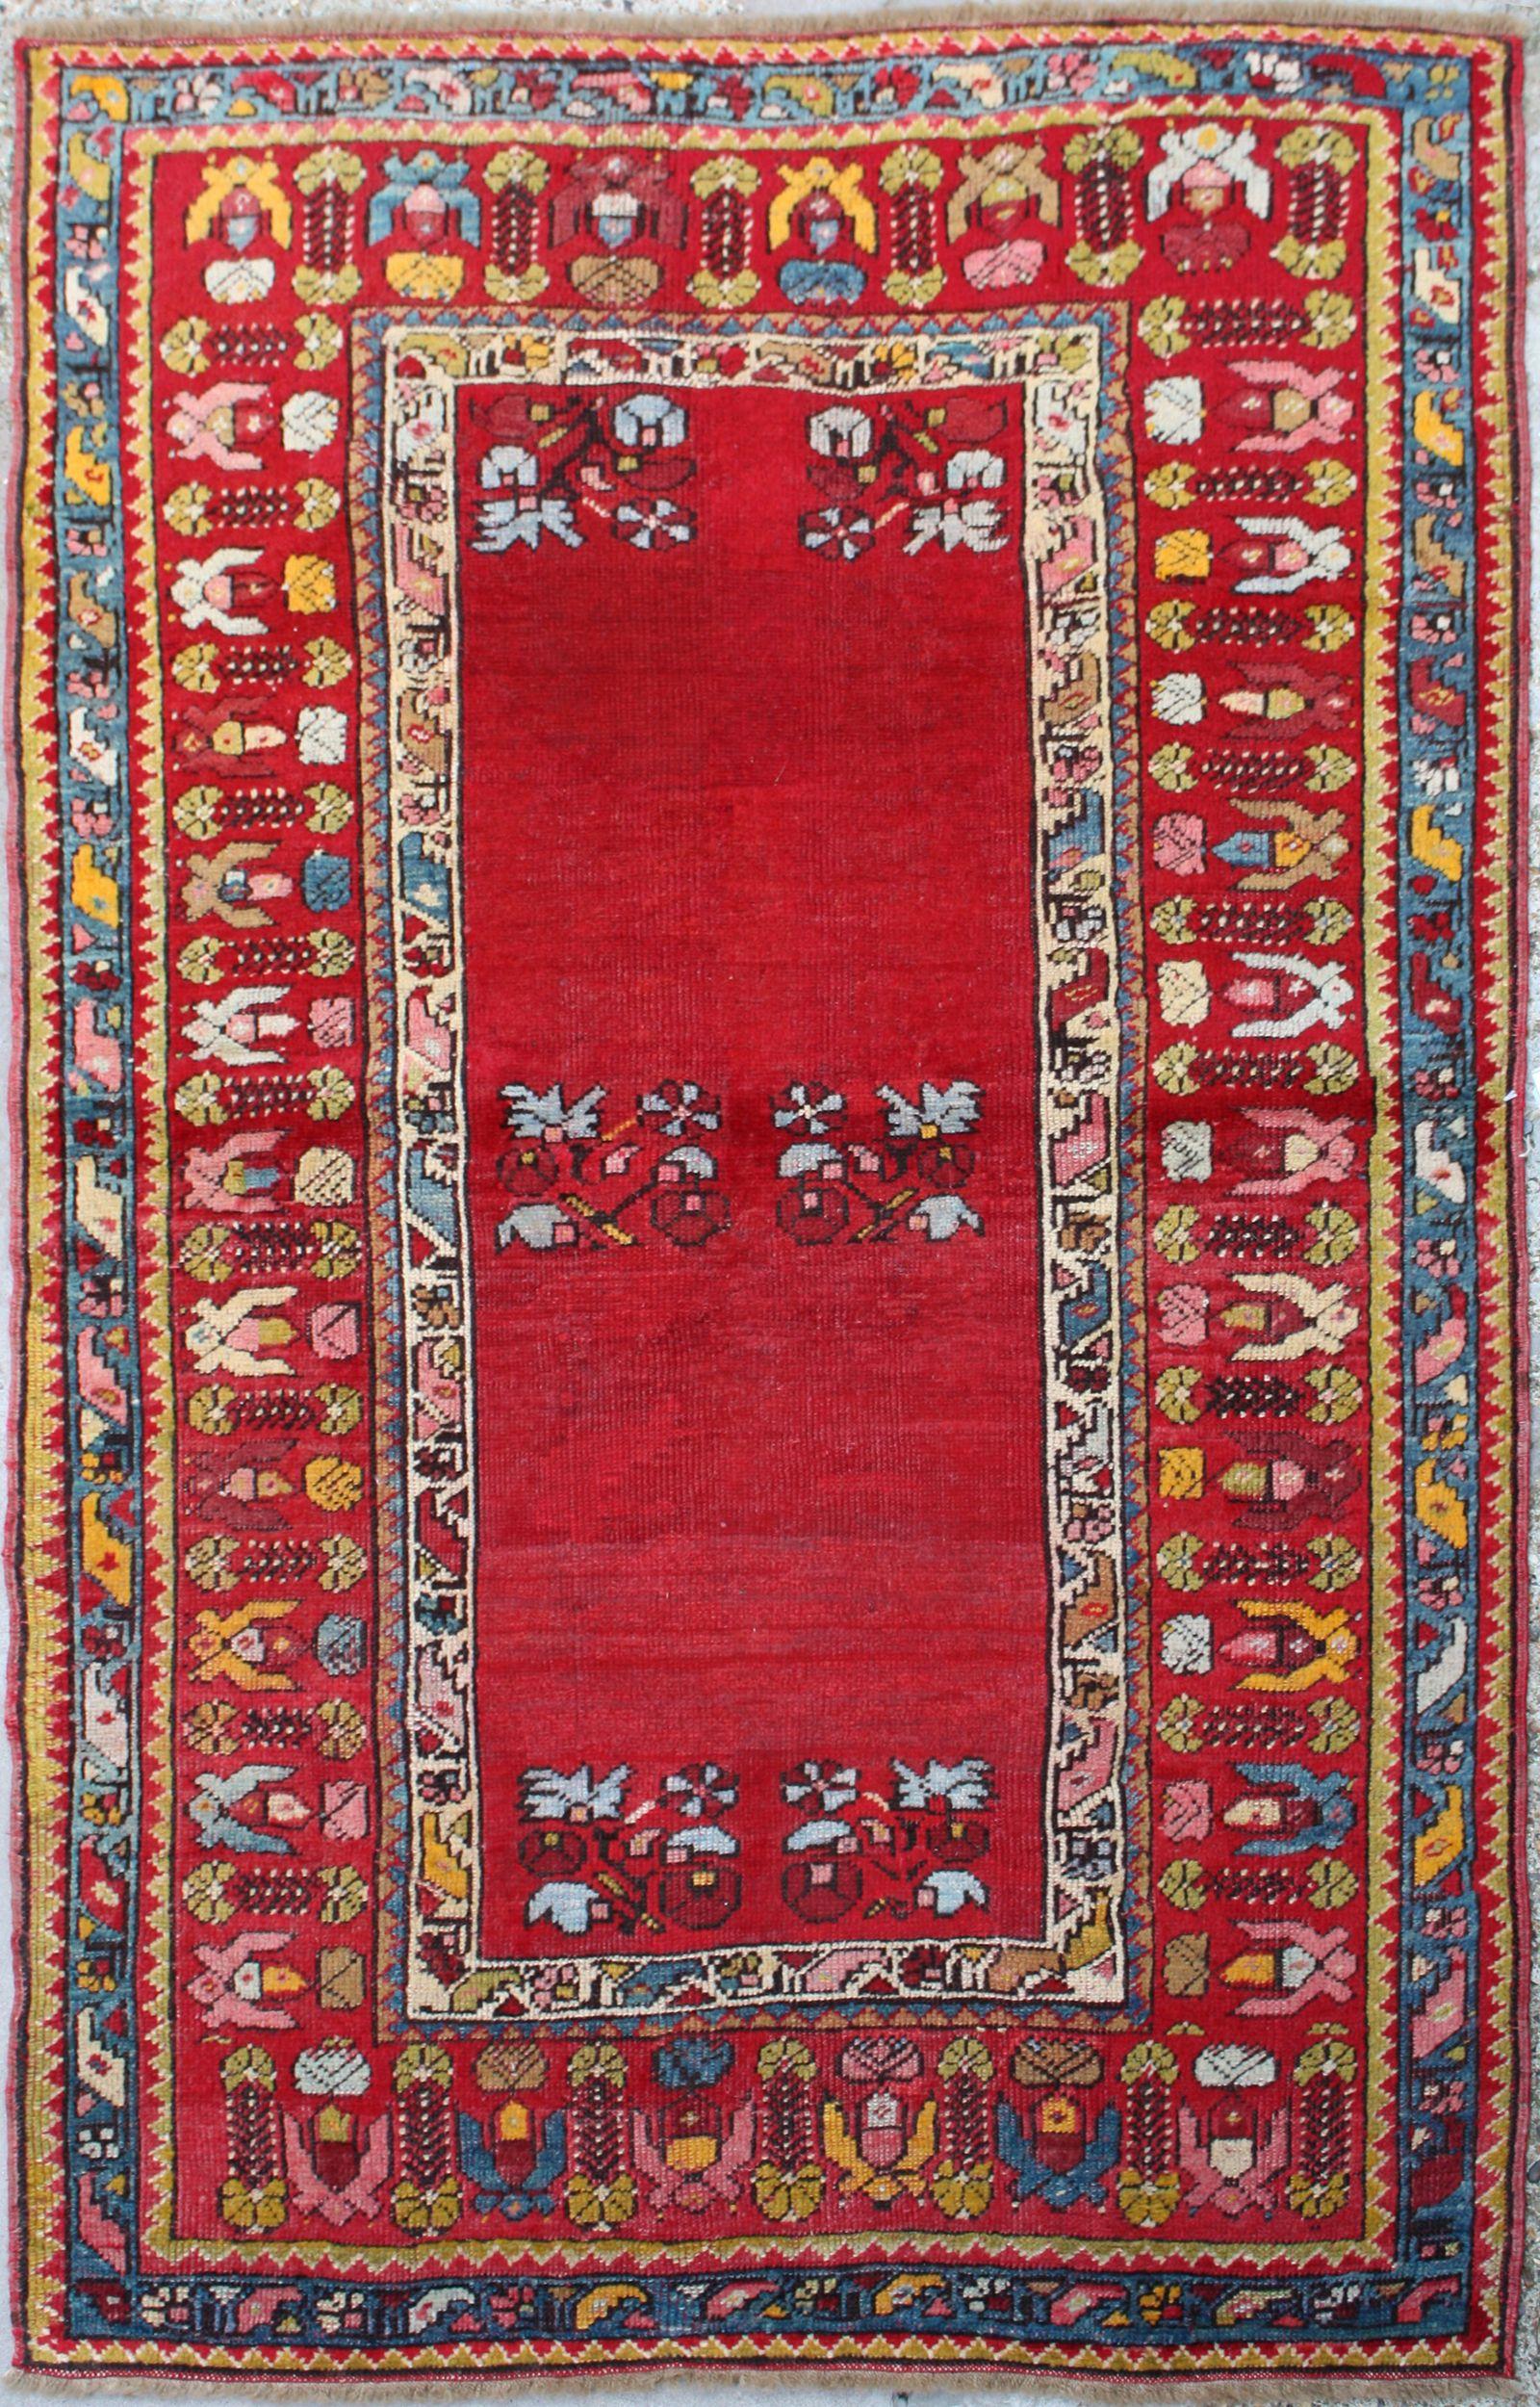 Mujur Rug, Turkish Rugs, Large Rugs, Math, Persian Rugs Carpets, Afghan